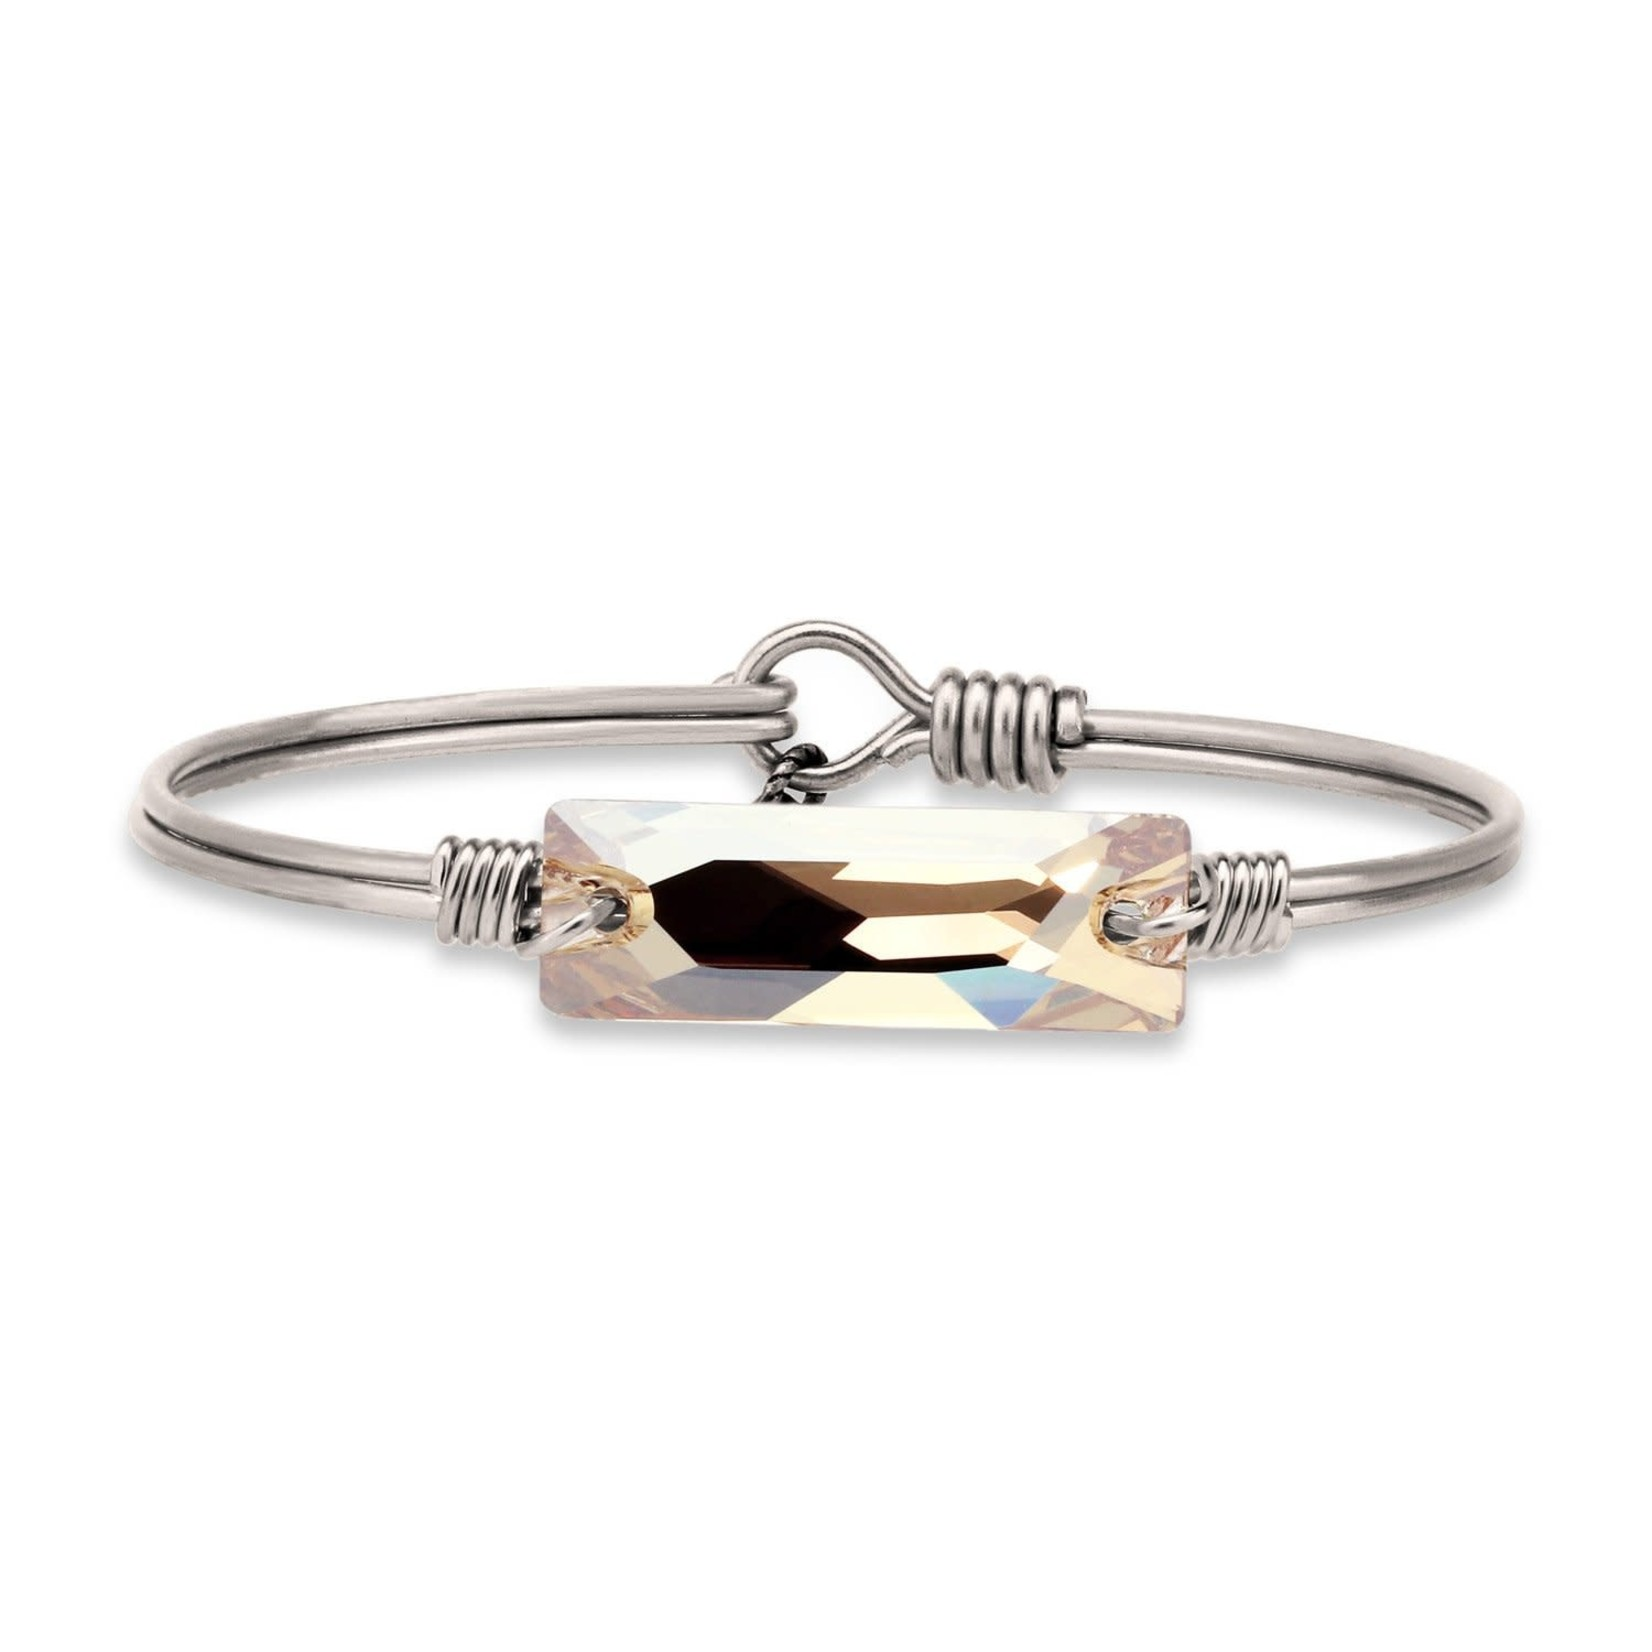 Luca+Danni Hudson Bangle Bracelet In Champagne/Silver Tone/Regular